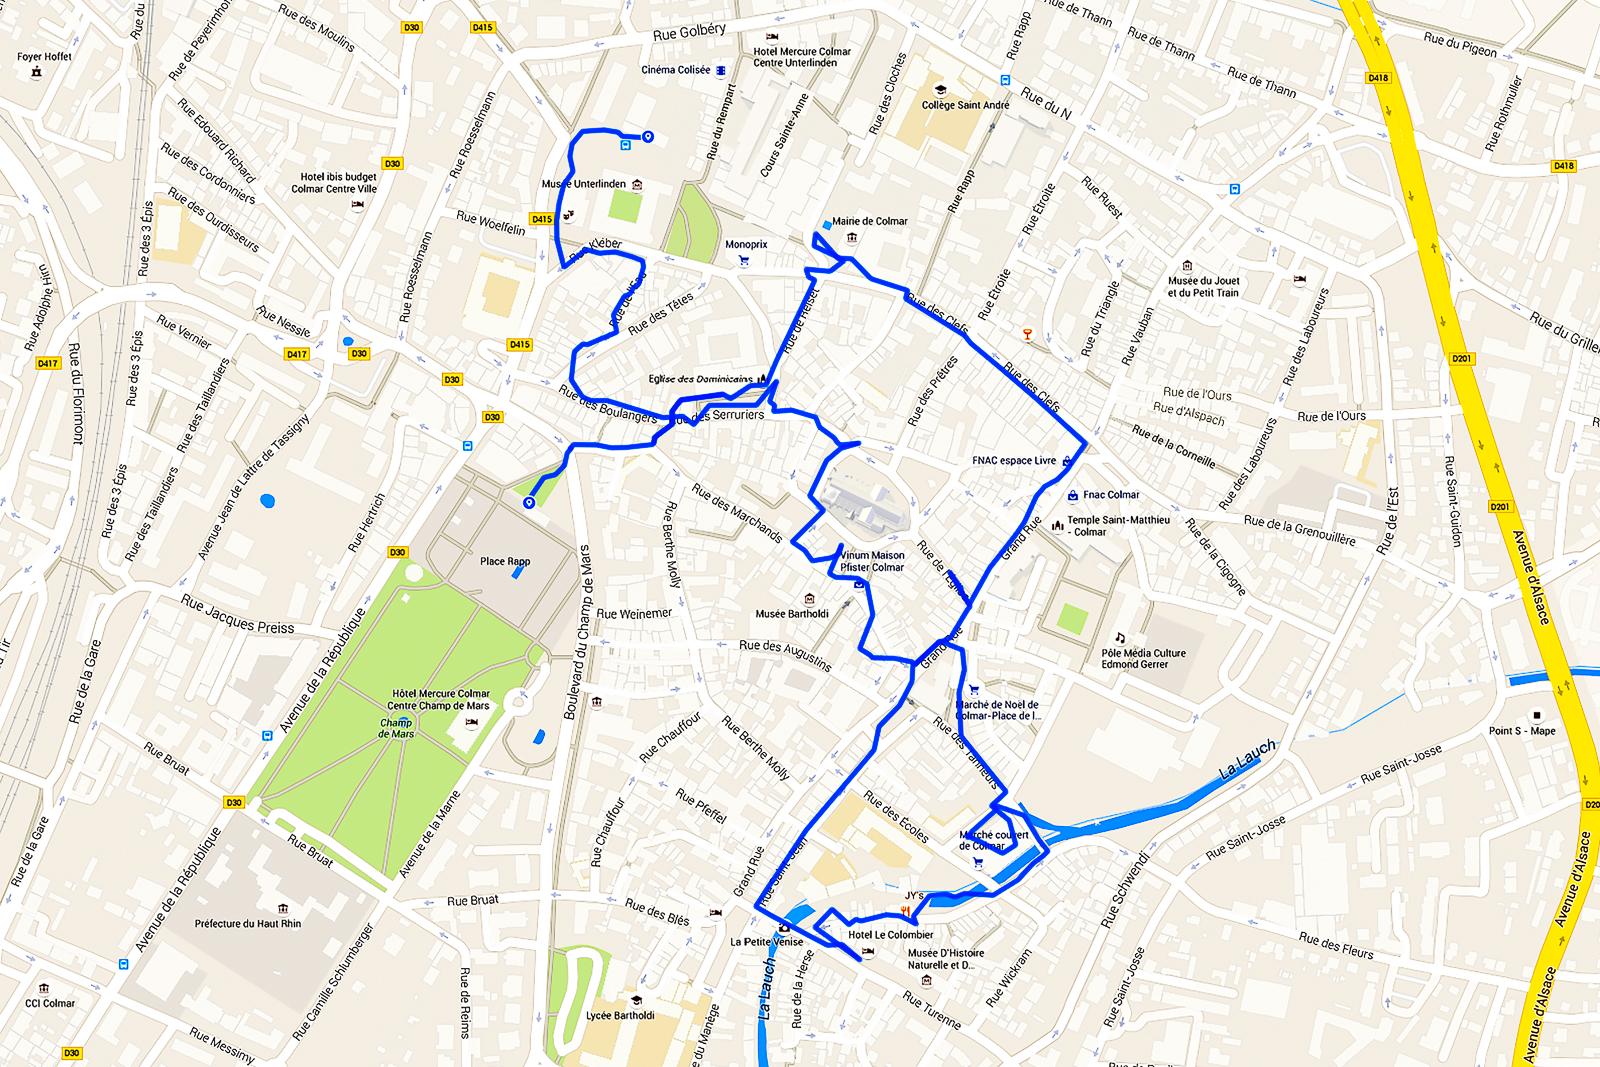 Dag01-Alsace-035-StadswandelingColmar